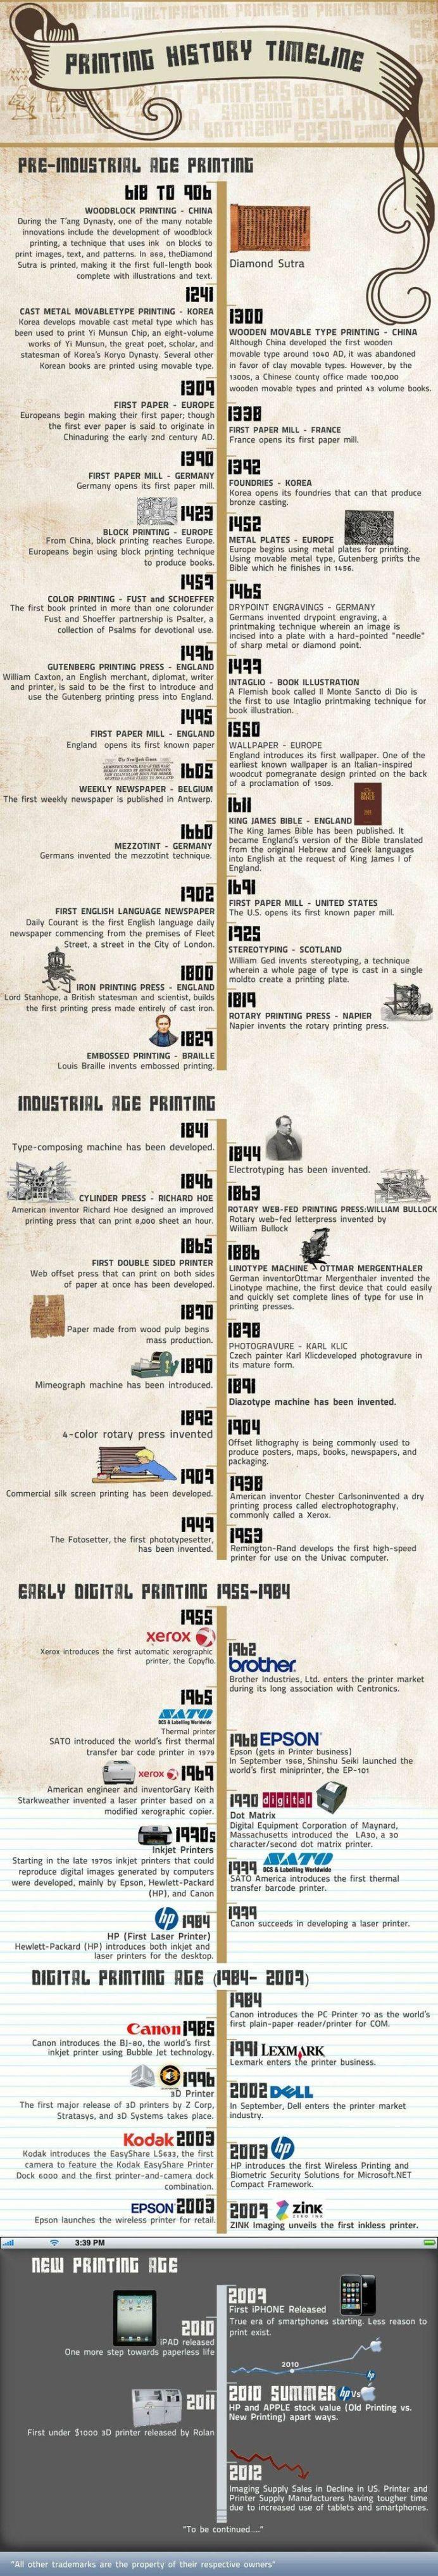 Printing History Timeline